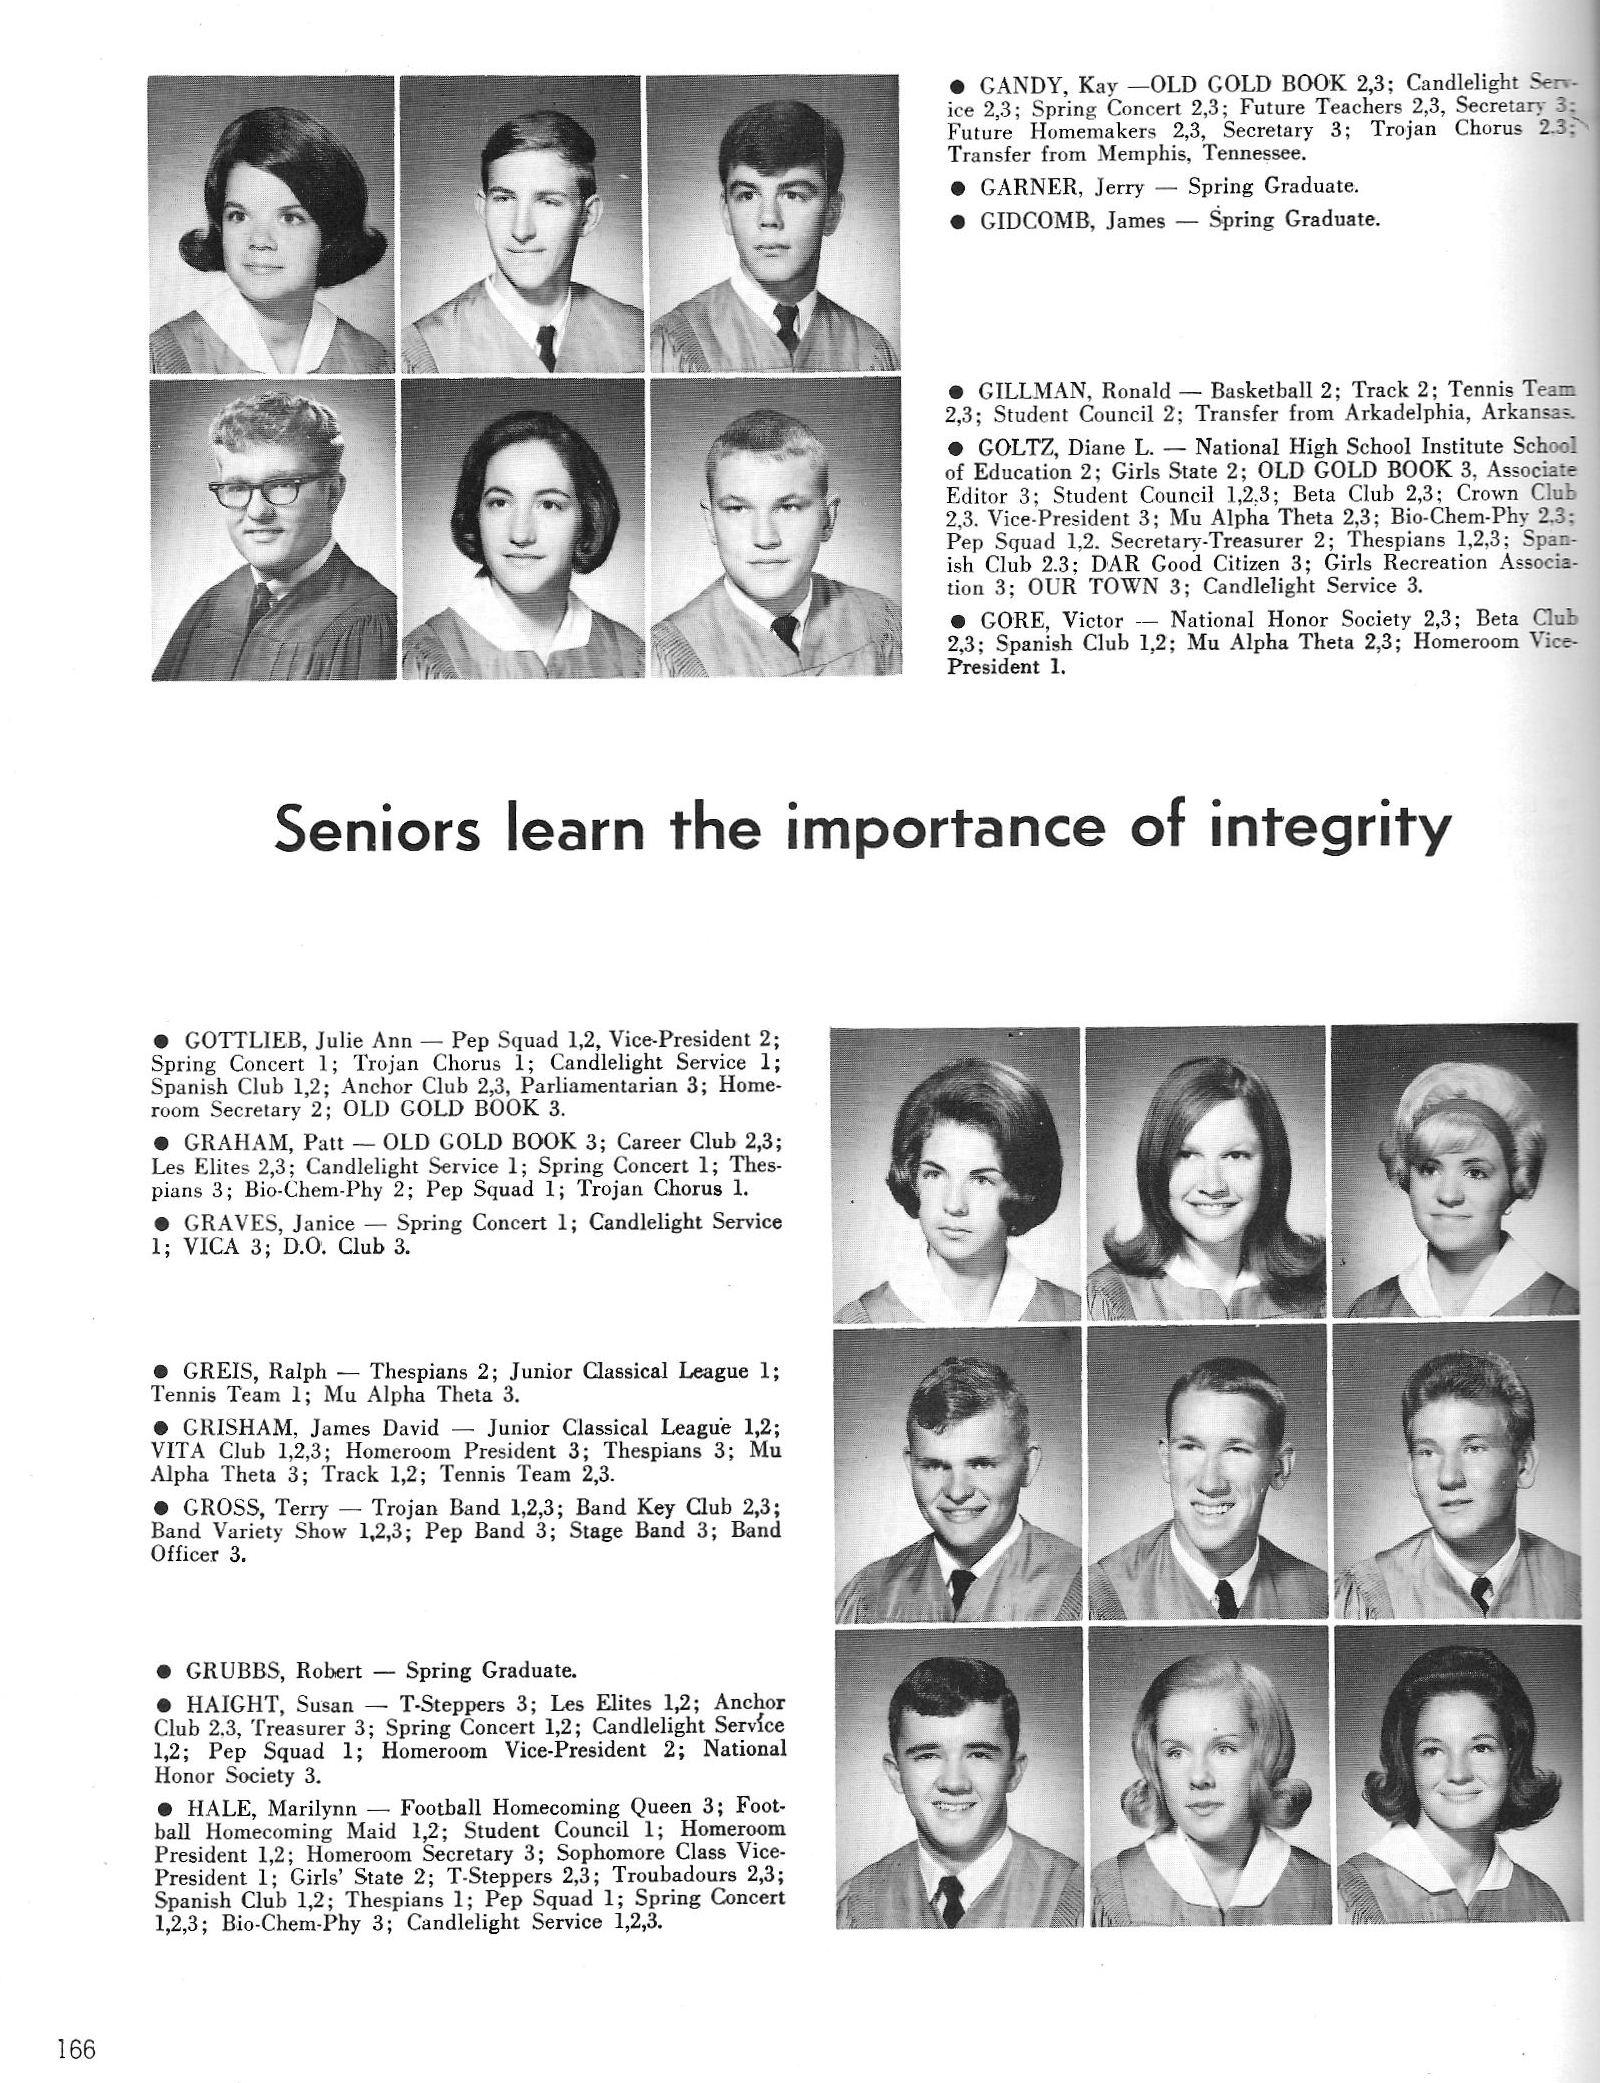 1967 Old Gold Book, Hot Springs, Arkansas, Yearbook